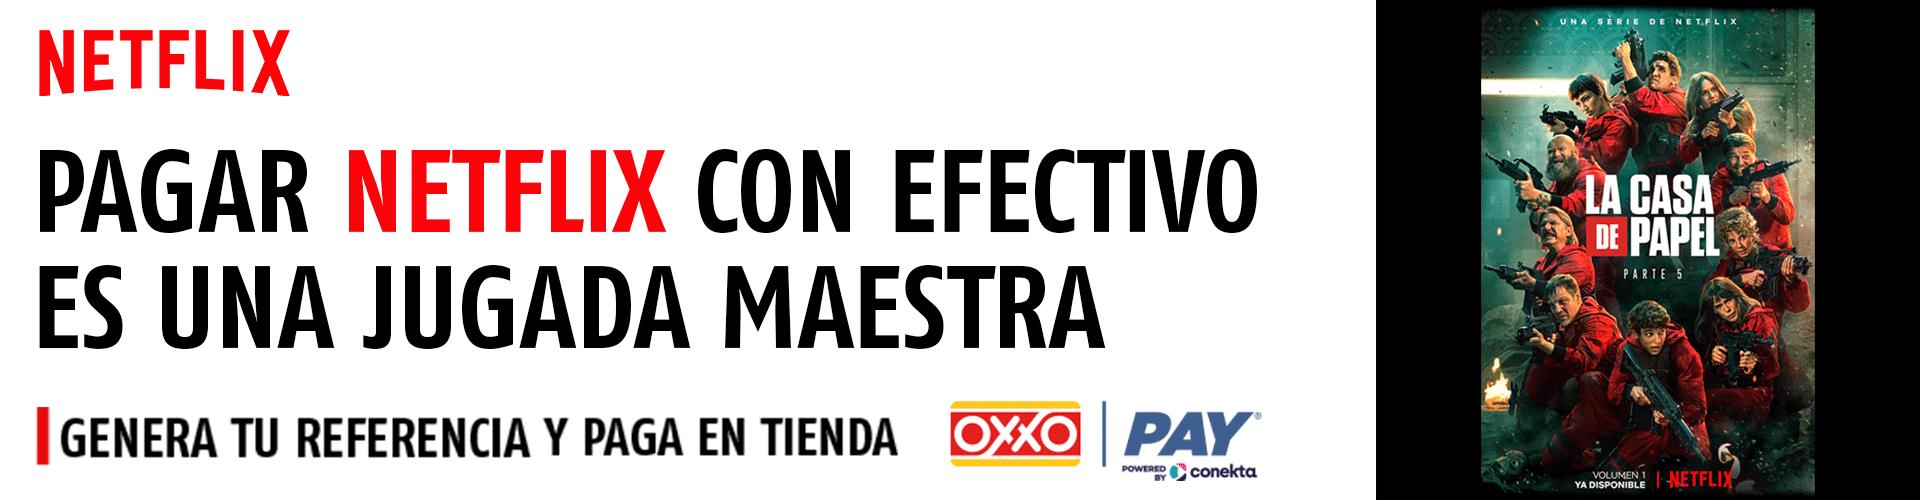 OXXO Home Netflix P10 2021